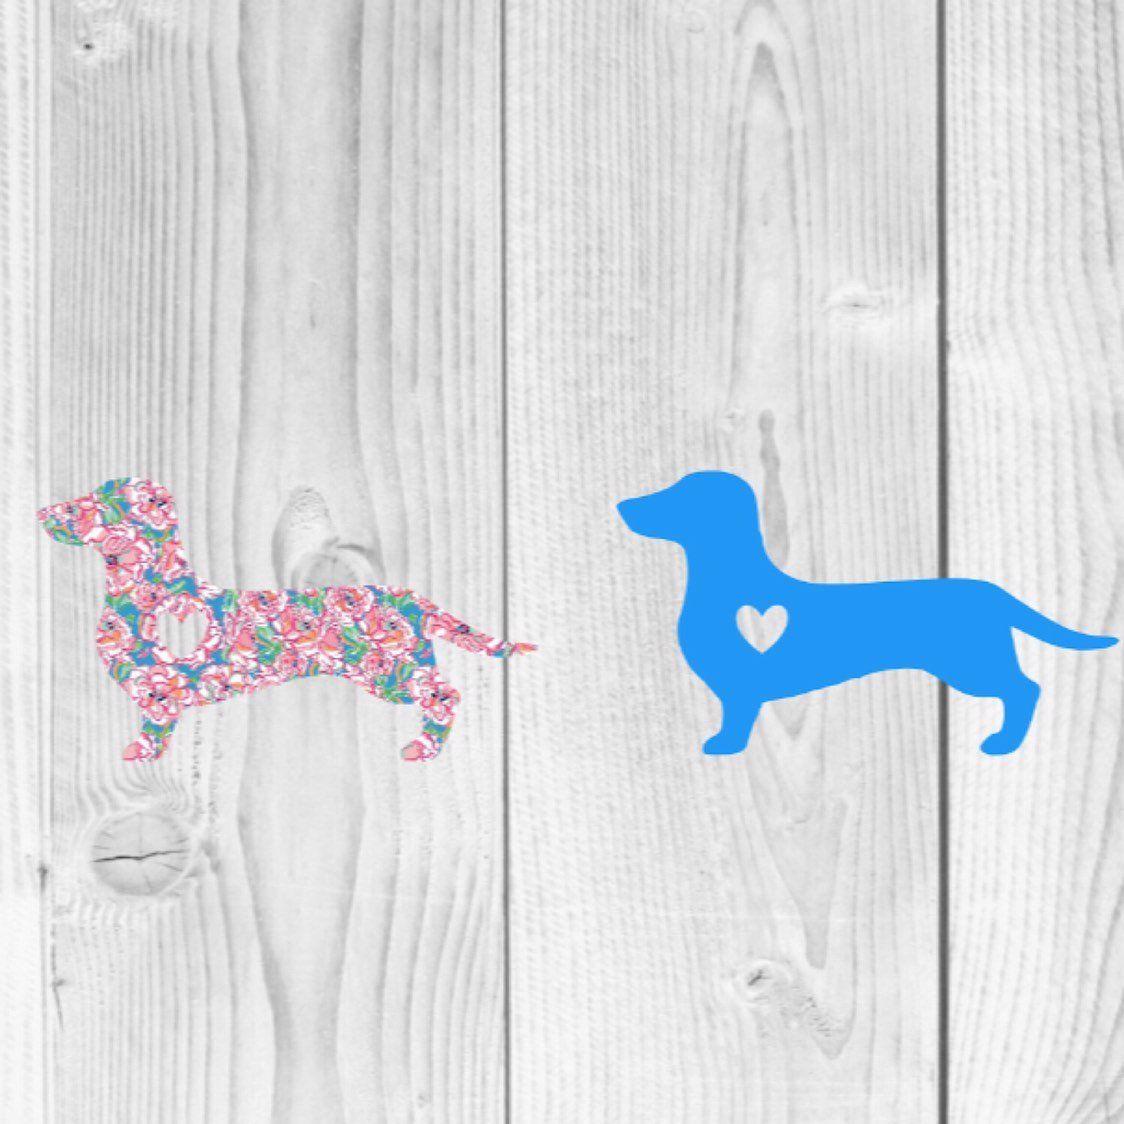 Dachshund Decal Dachshund Dog Sticker Dachshund Sticker Etsy Dog Stickers Dog Decals Monogram Decal [ 1124 x 1124 Pixel ]